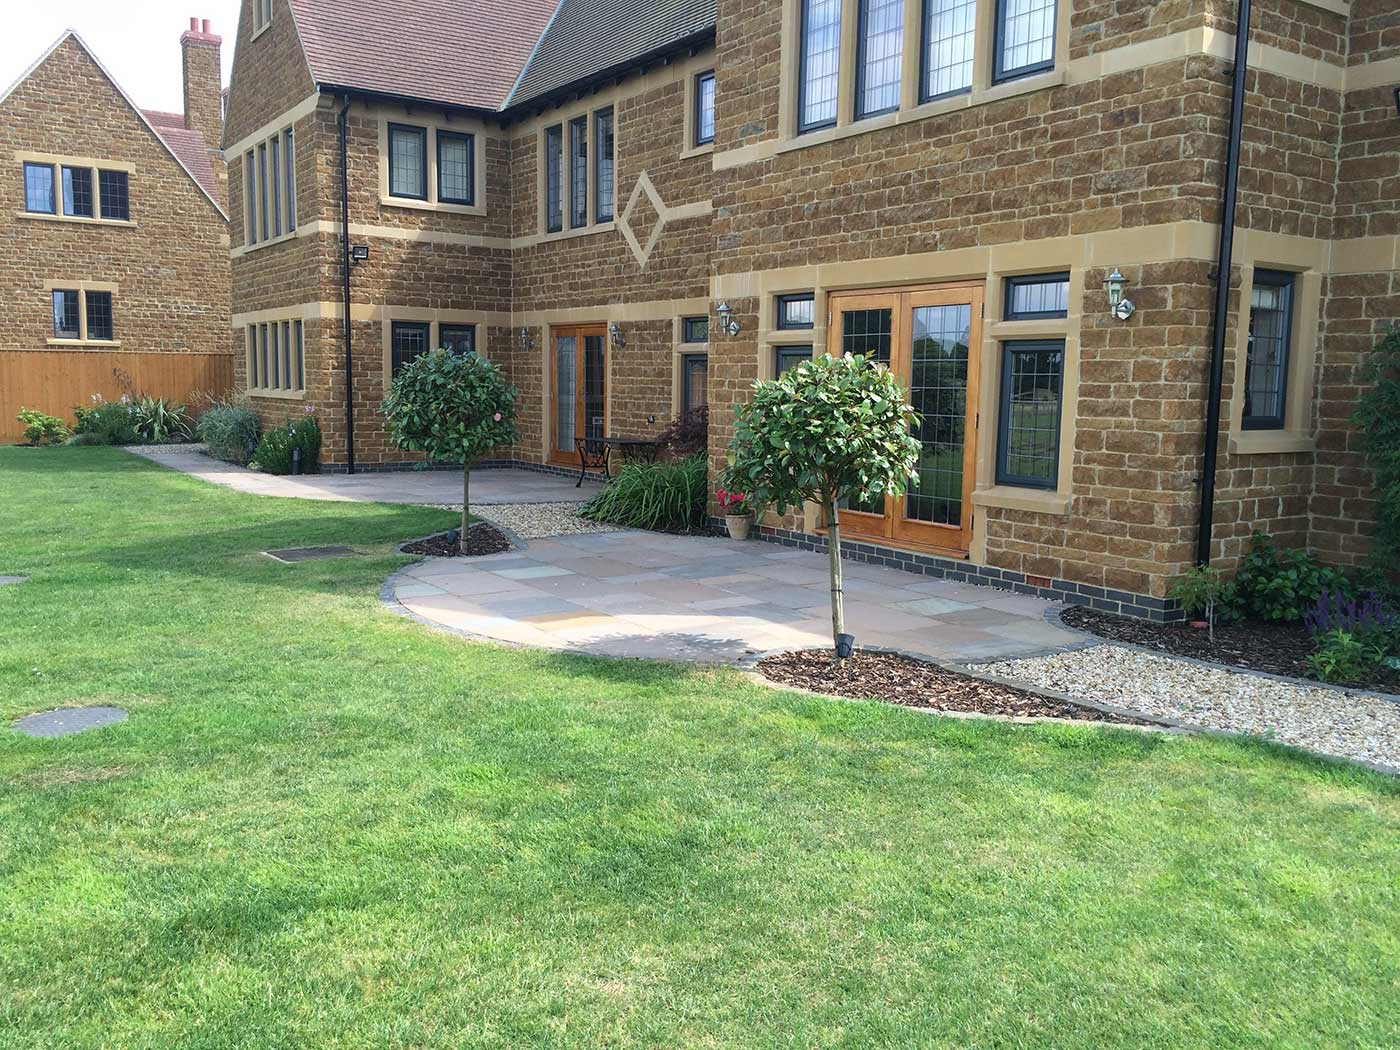 3-1 - Gardens For Good - Garden Design in Oxfordshire ...